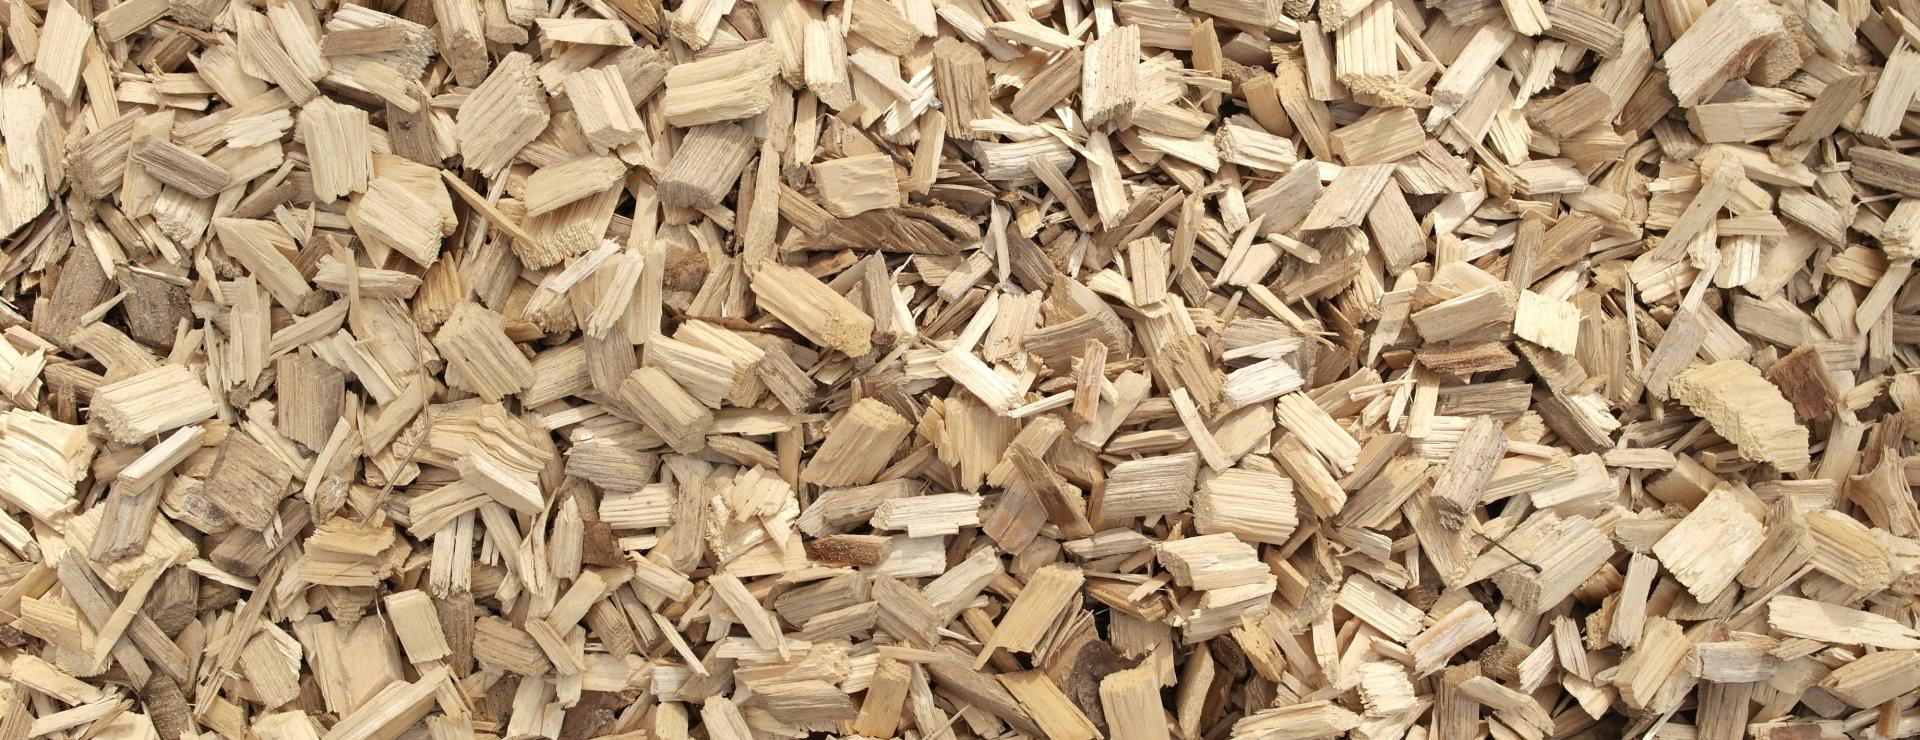 Logs & Biofuel